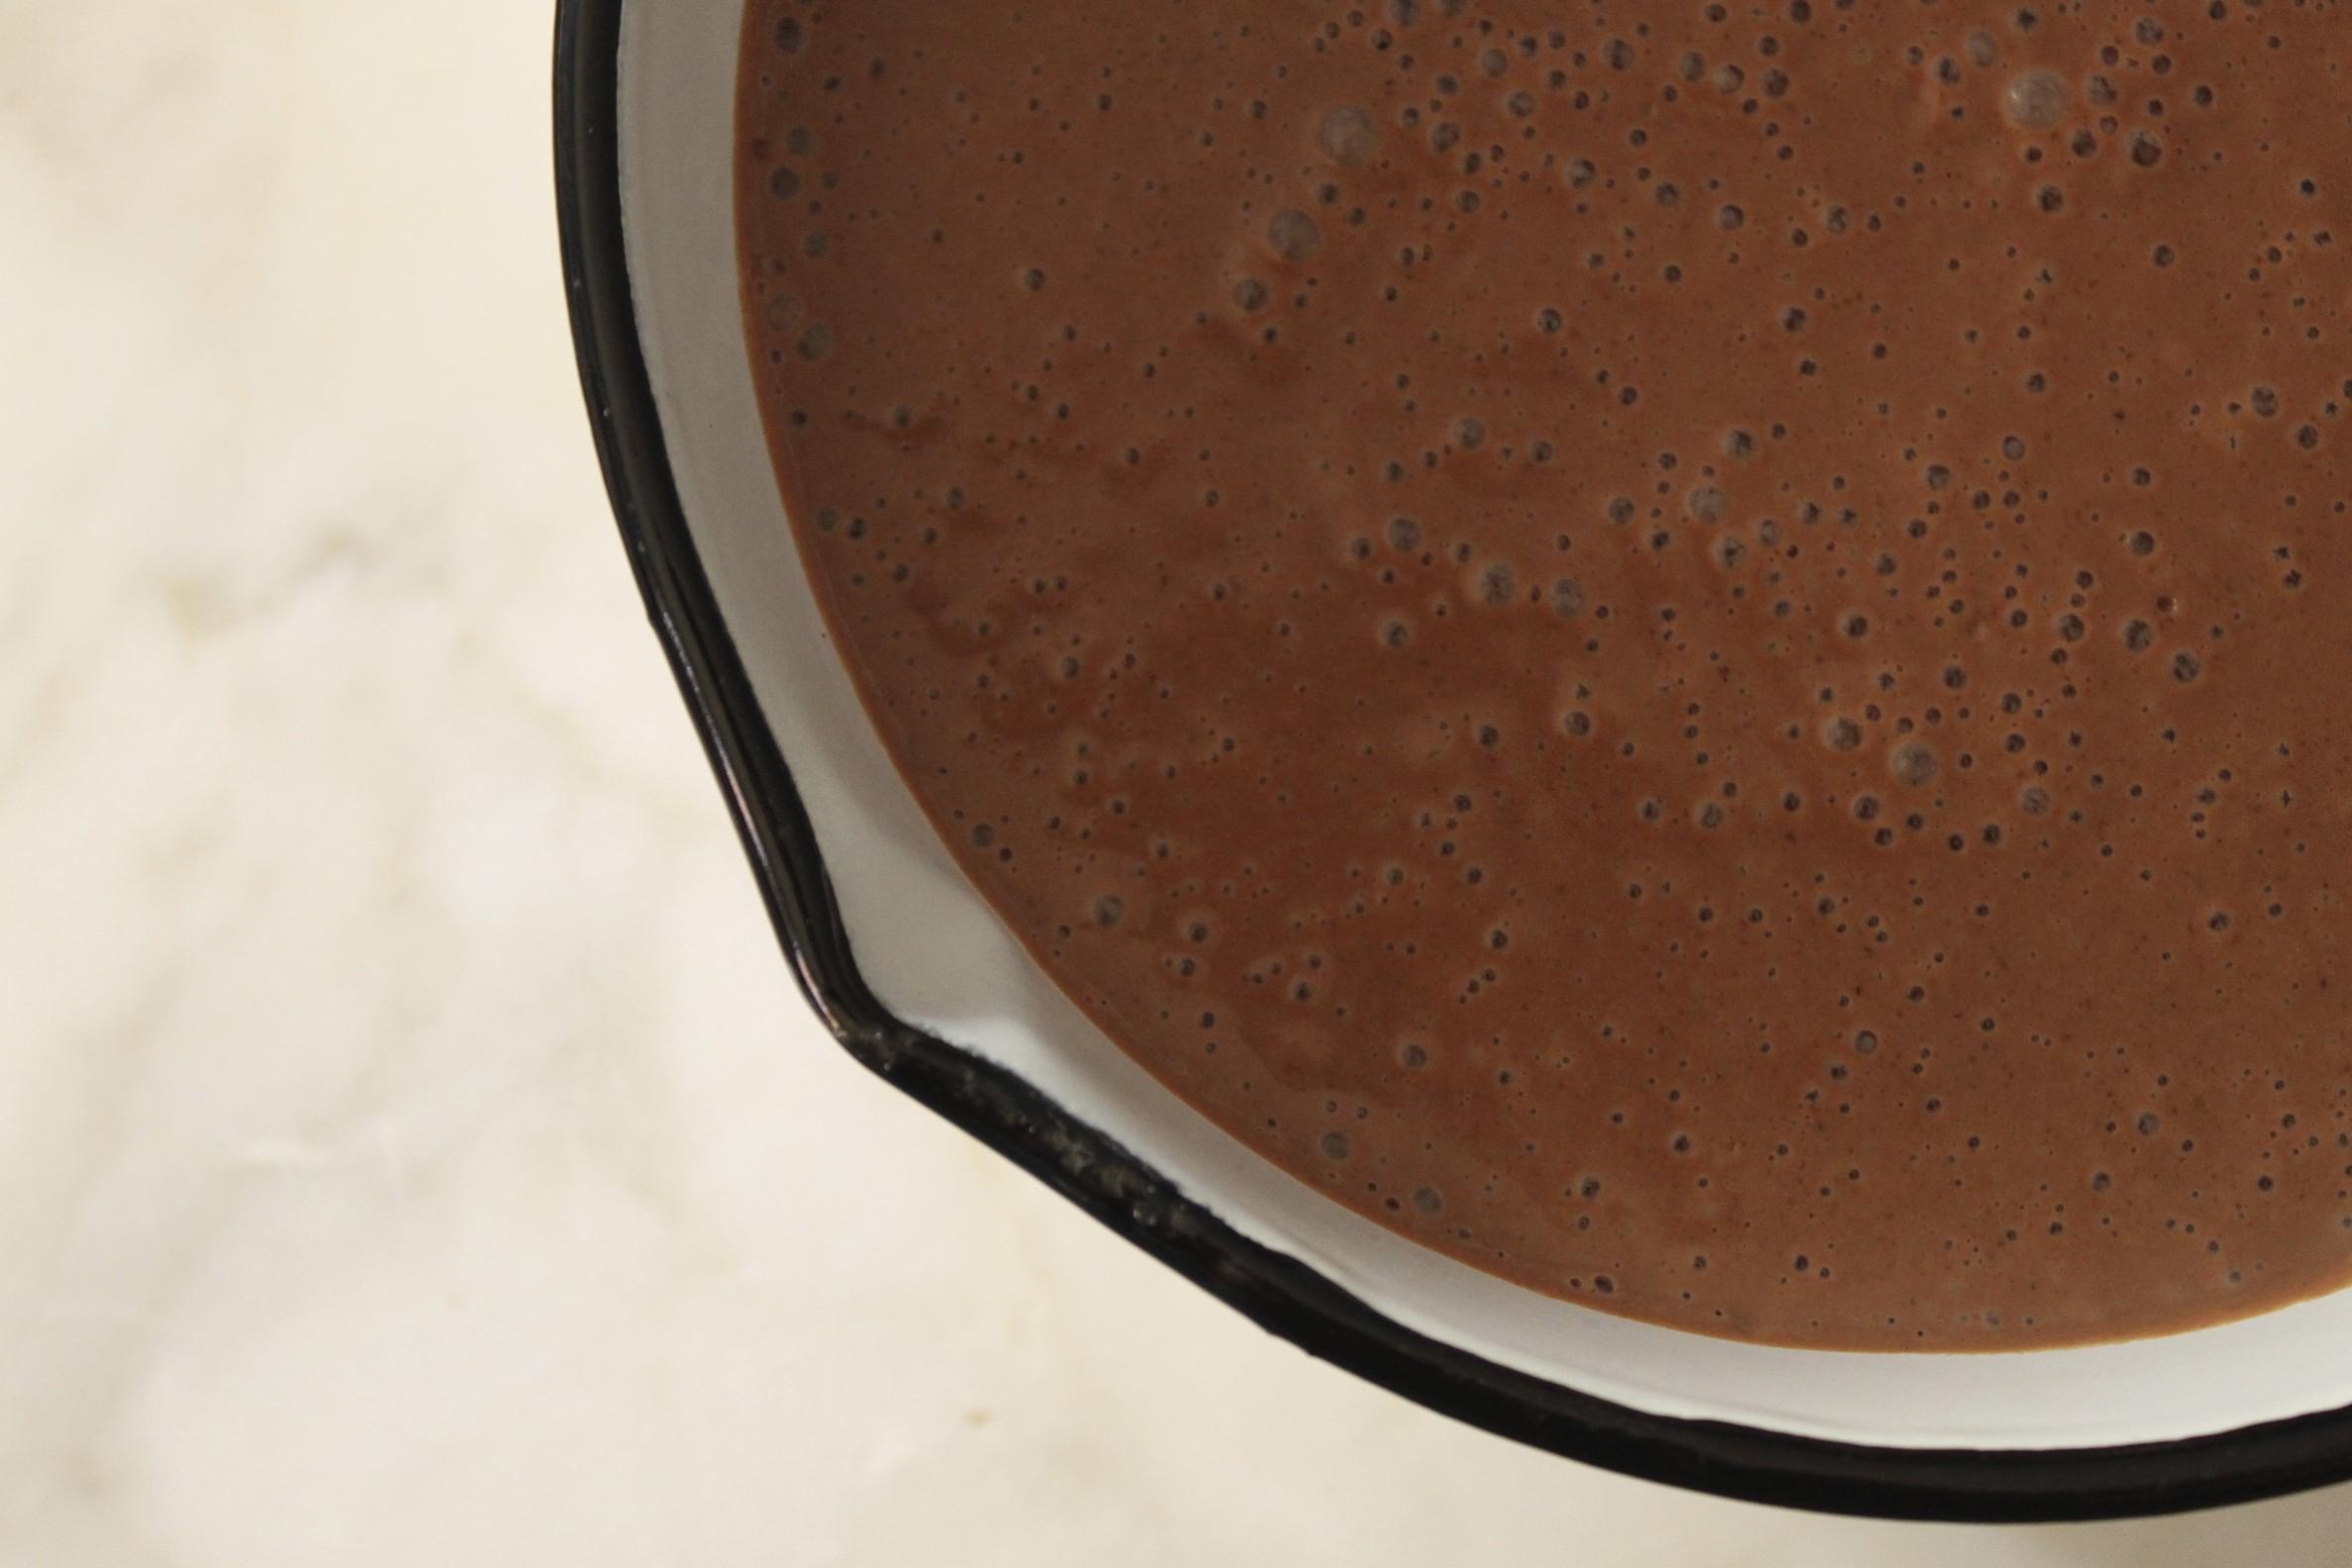 Inca Hot Chocolate